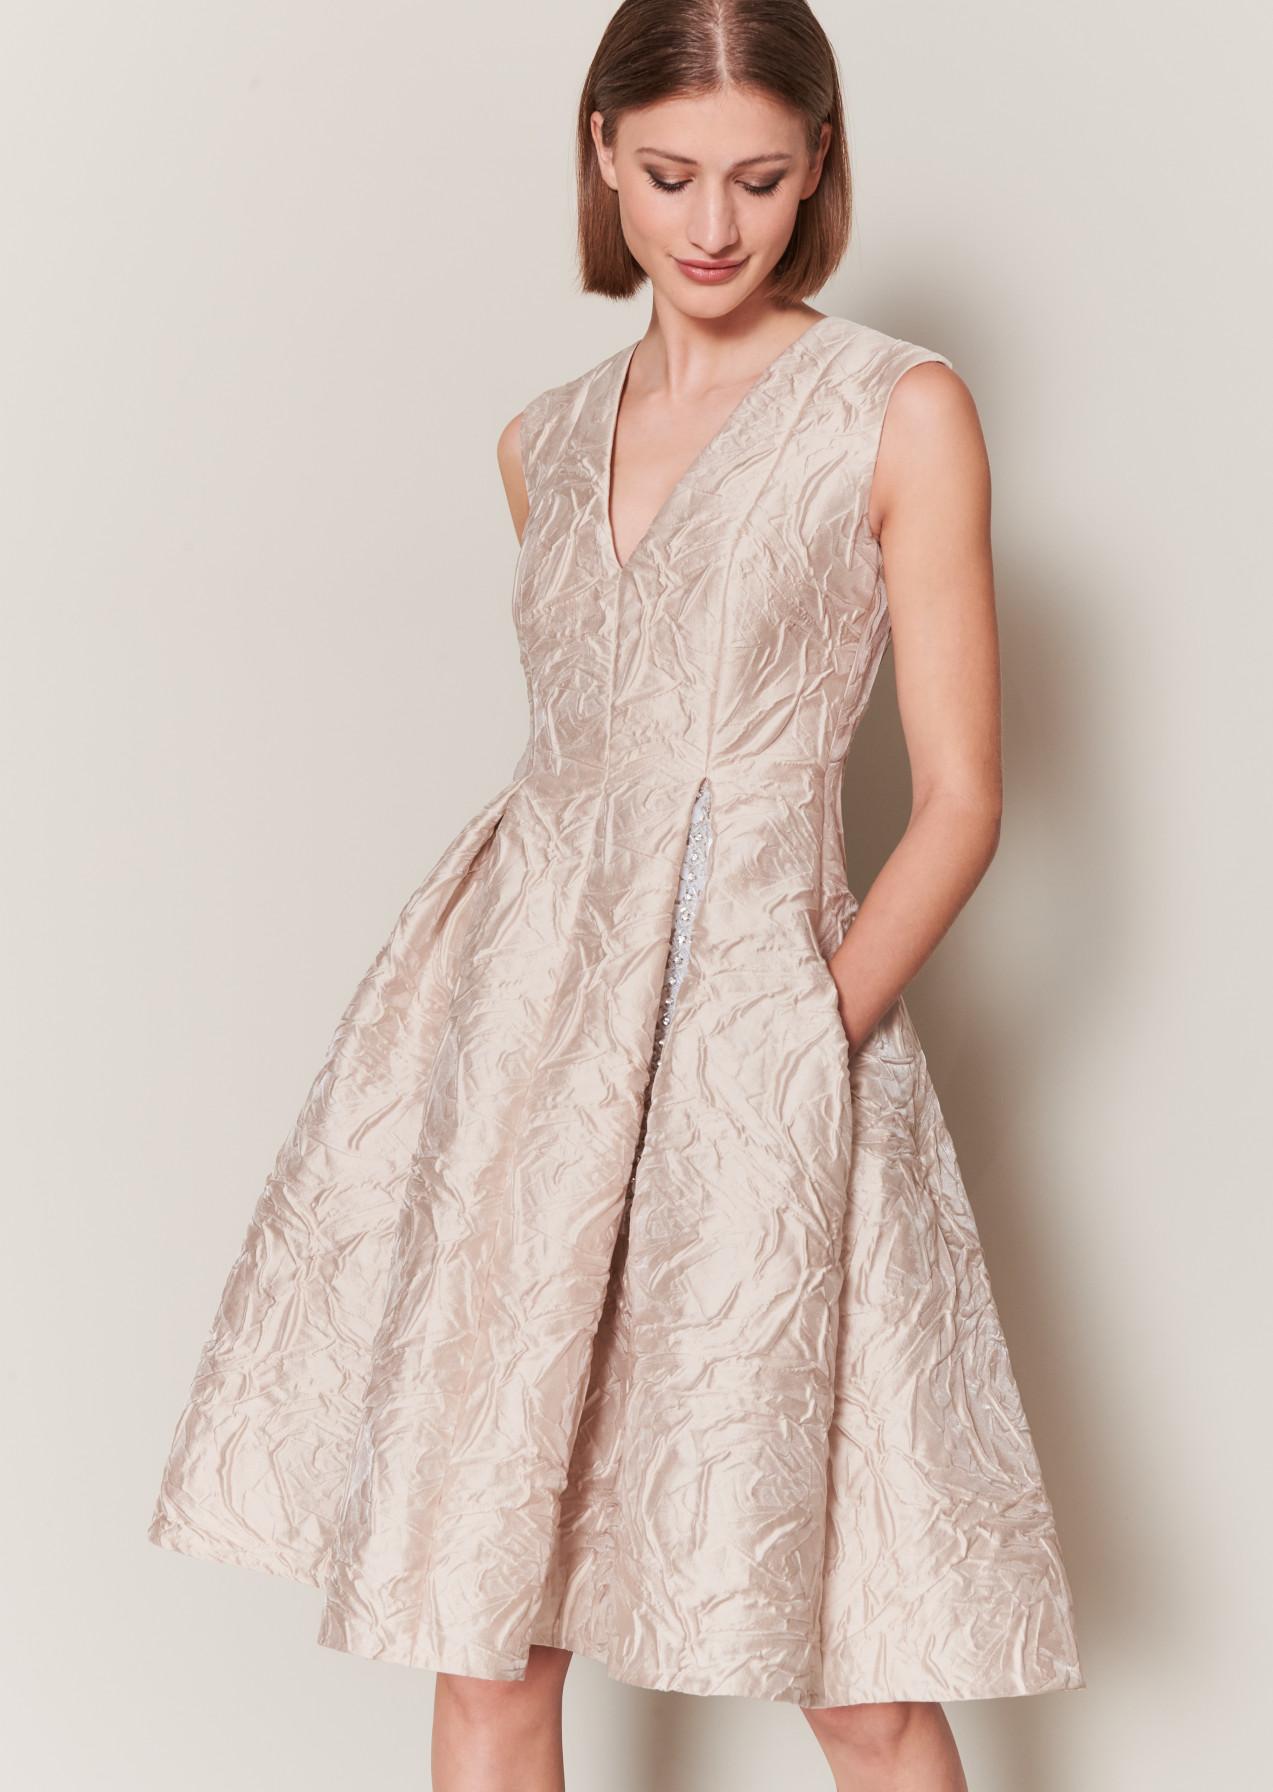 Cocktail Dresss